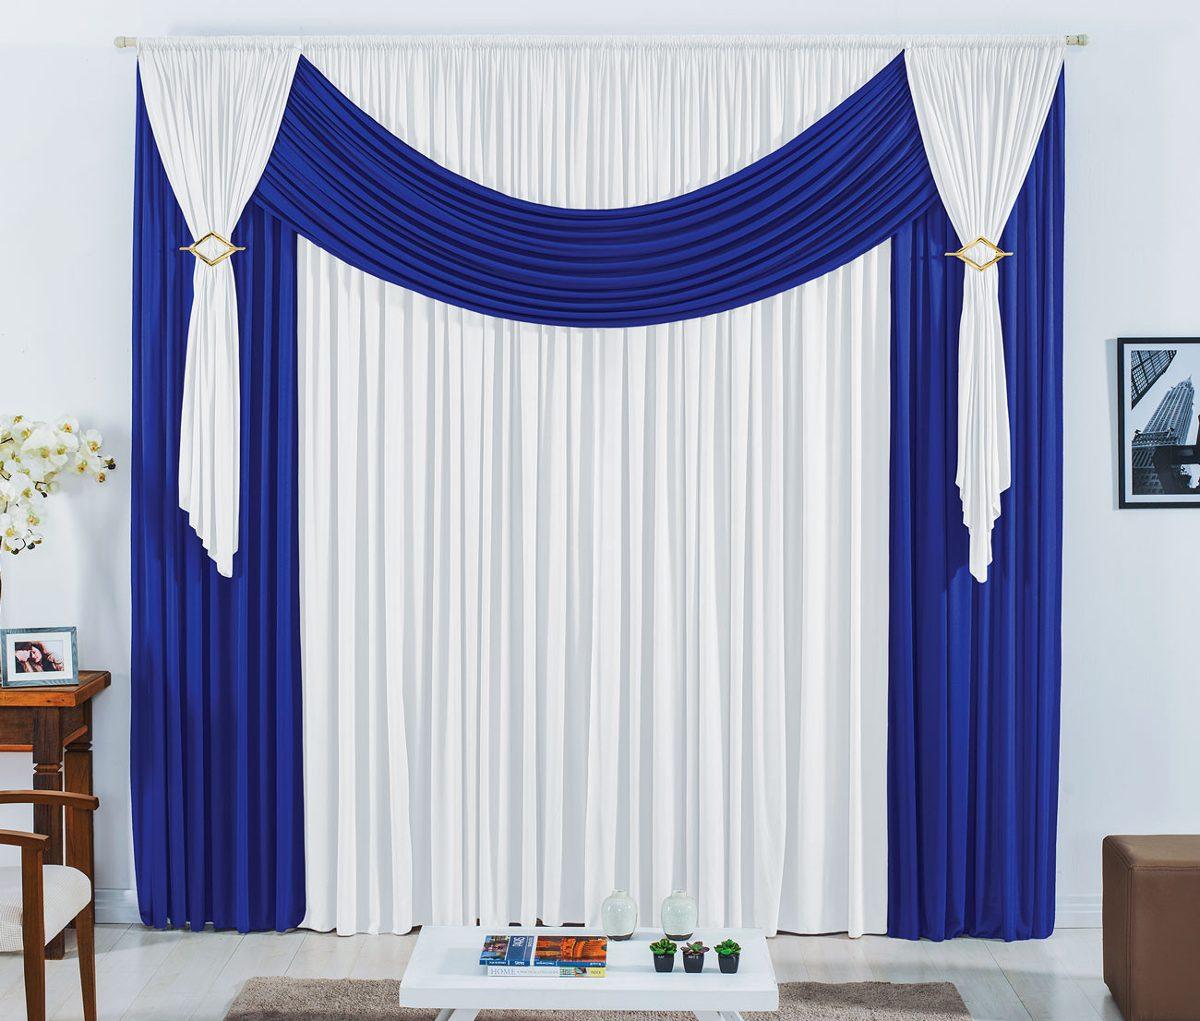 Cortina Para Varao De 6 Metros Azul Branco P Quarto Ou Sala R 189  -> Cortinas Para Sala Azul